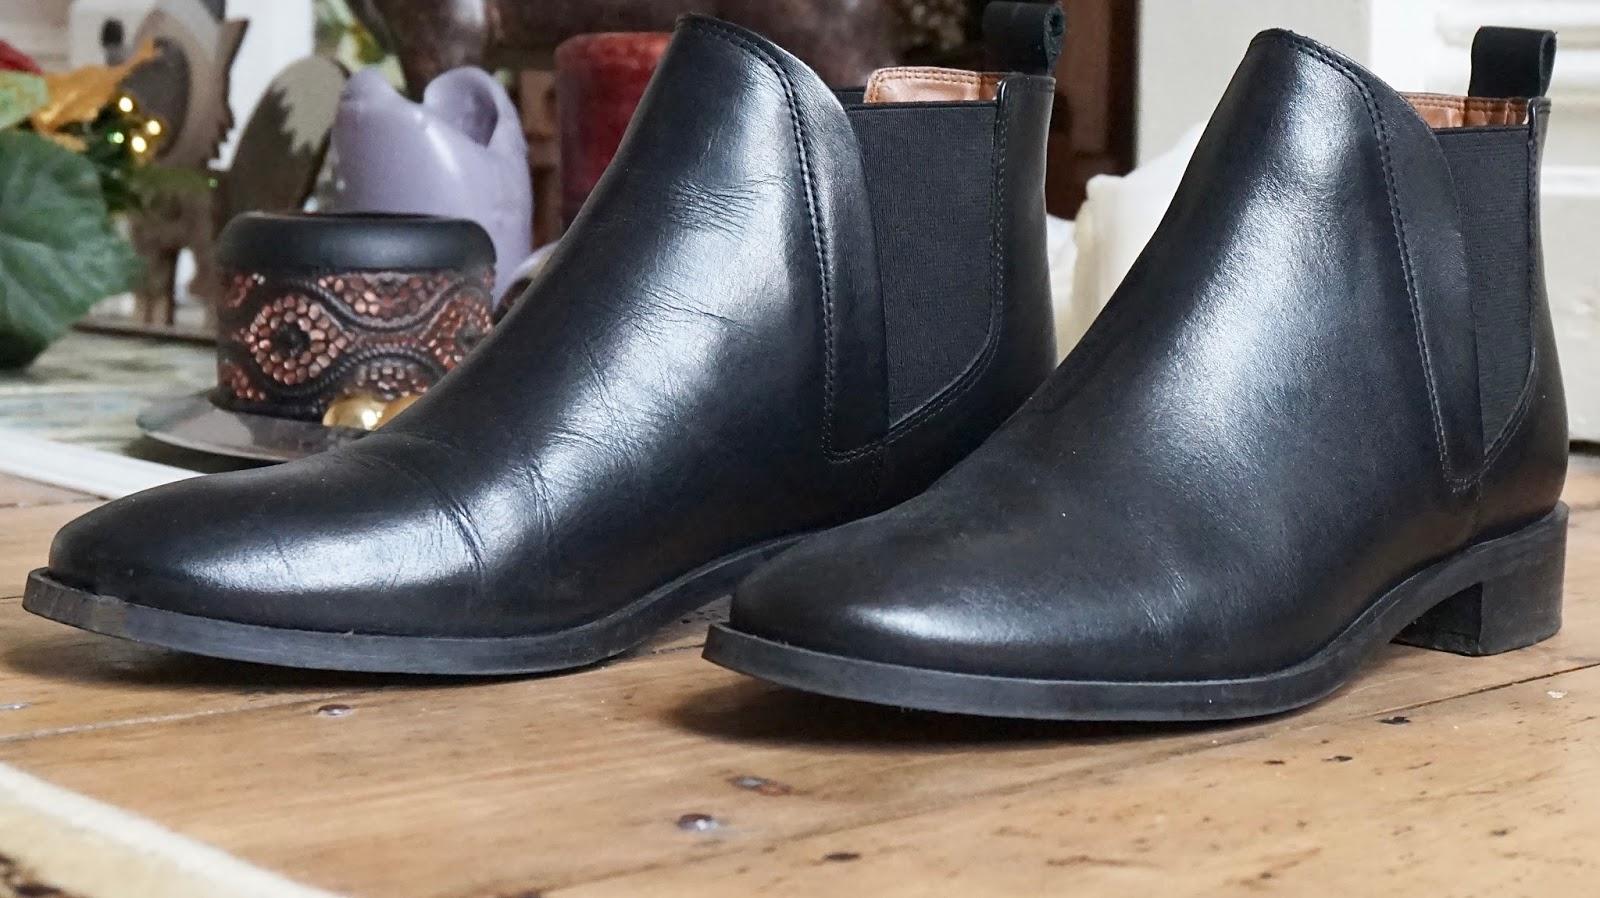 Wardrobe Staples | Chelsea Boots